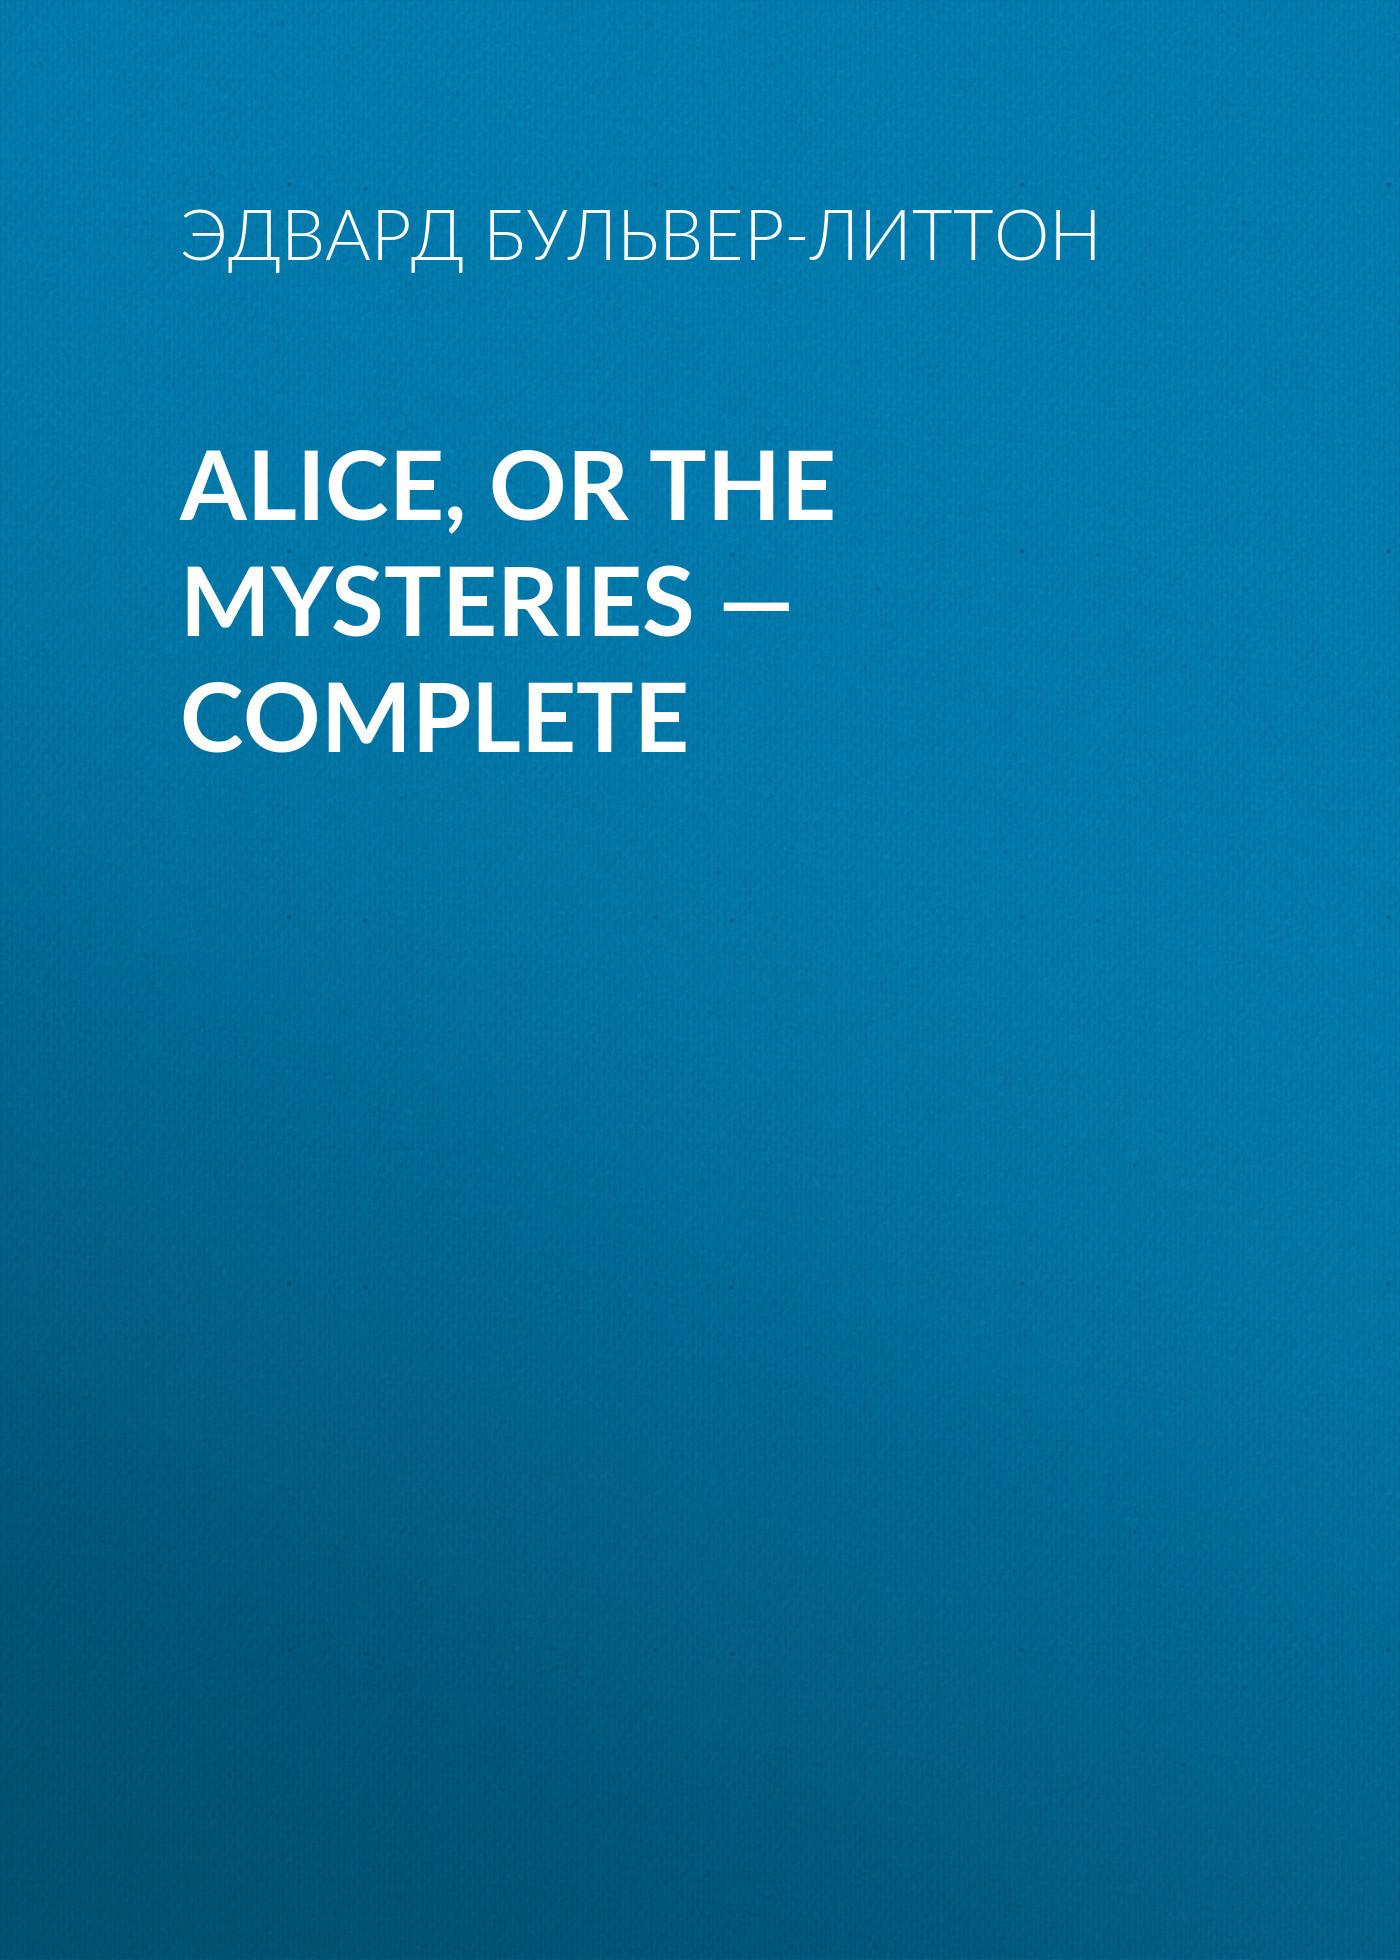 Эдвард Бульвер-Литтон Alice, or the Mysteries — Complete